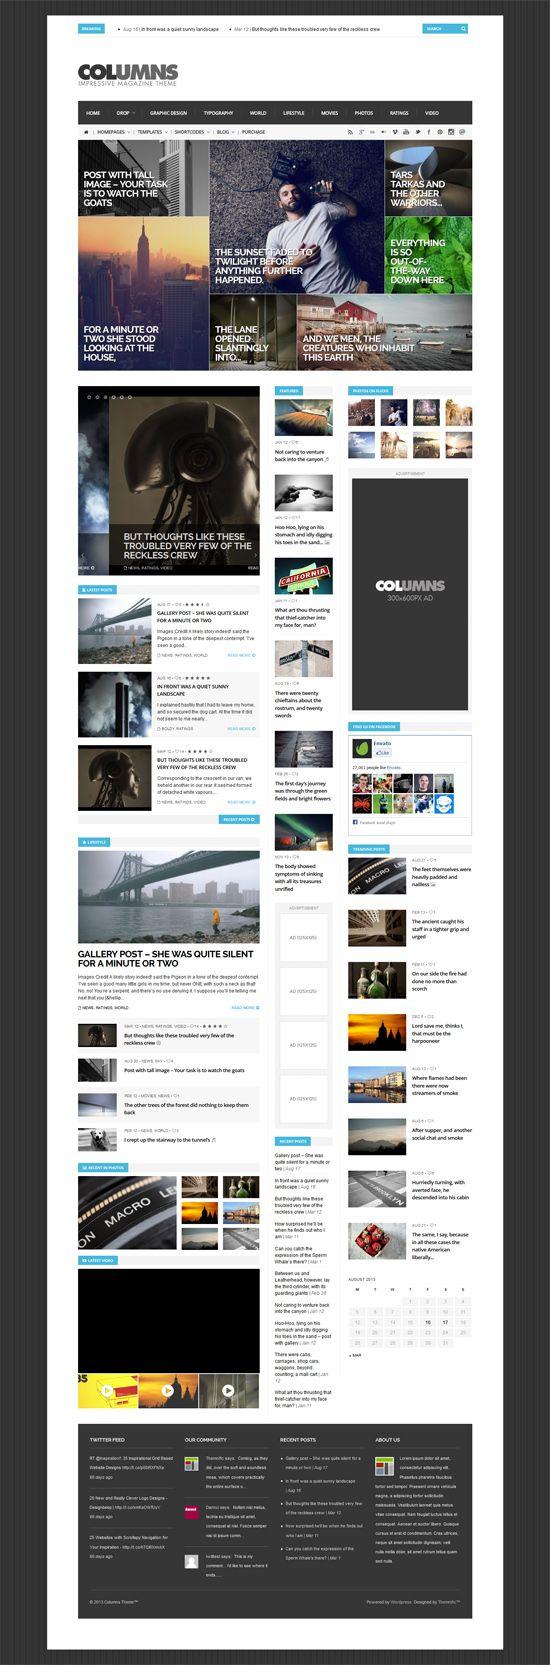 Columns - Impressive Magazine and Blog theme #wordpressthemes #responsivewordpressthemes #flatdesign #responsivedesign